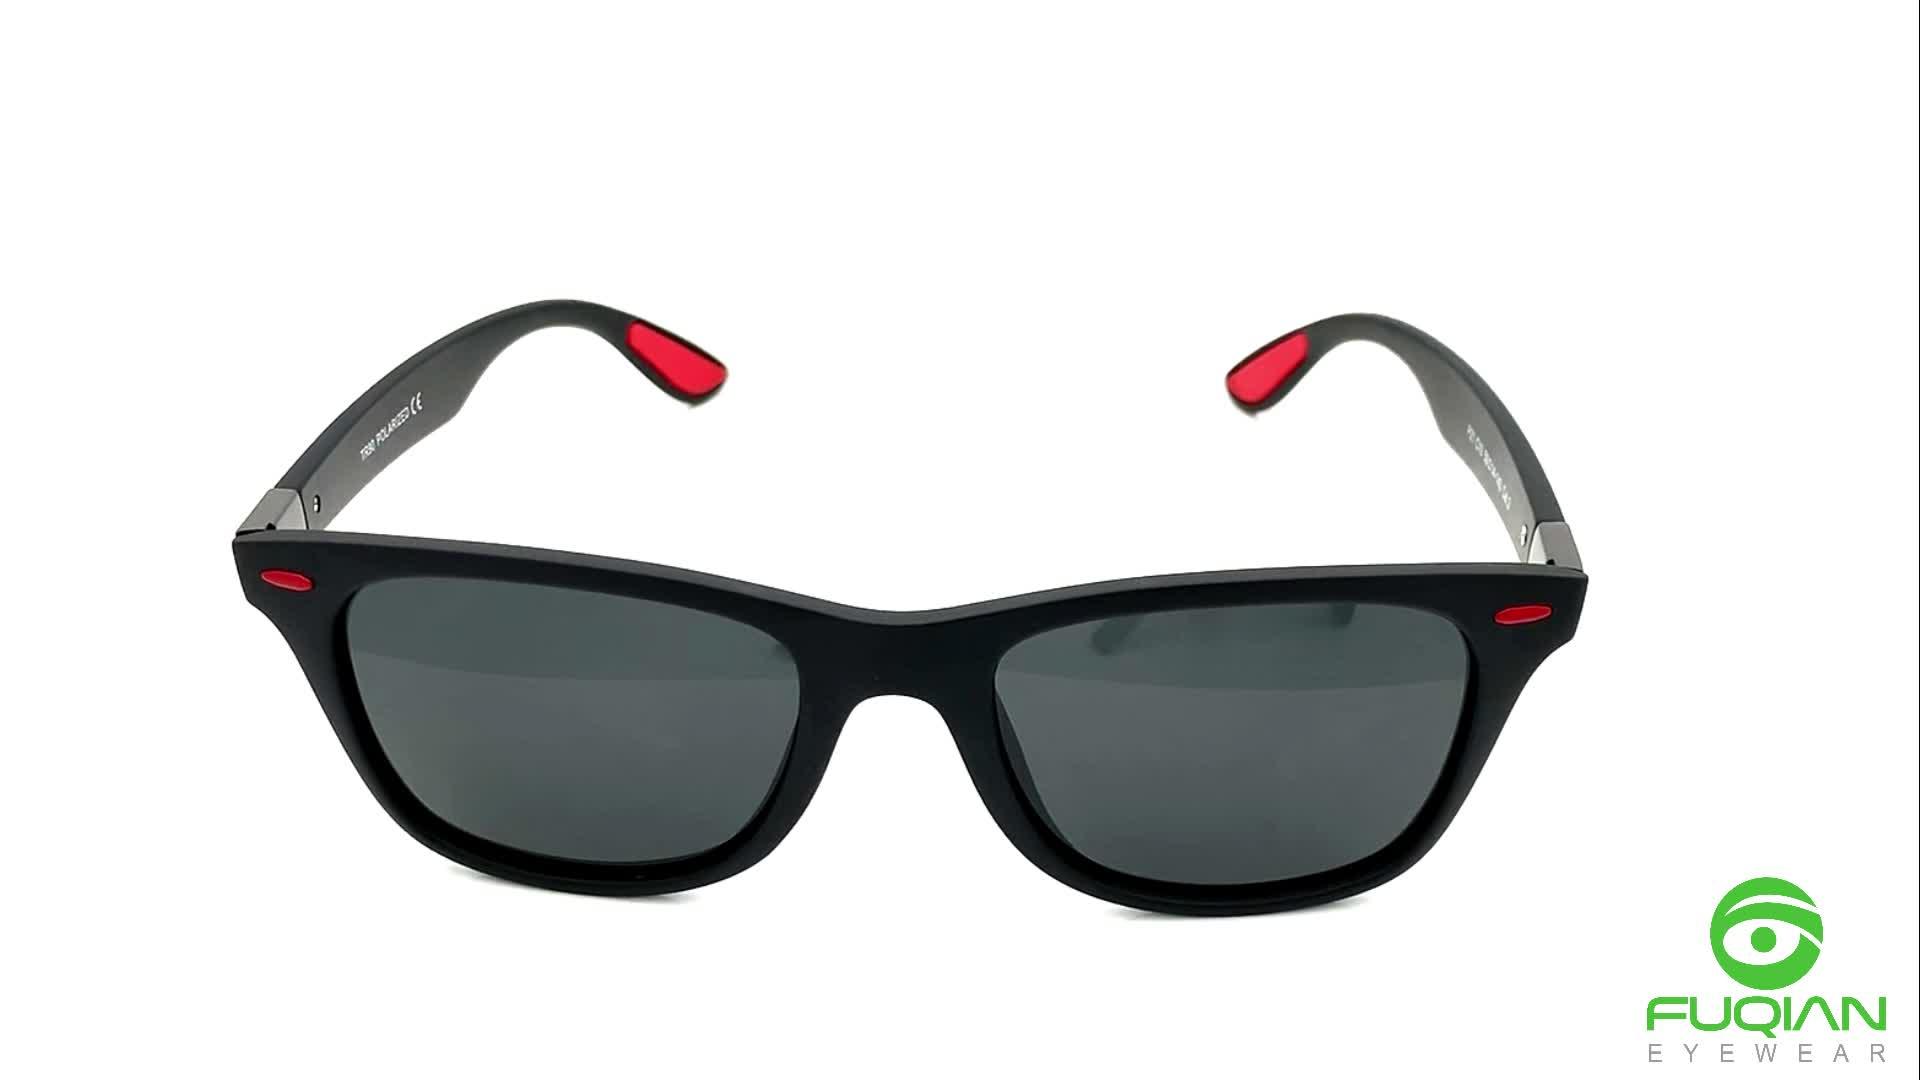 2019 most popular plastic square driving eyewear mens sunglasses polarized